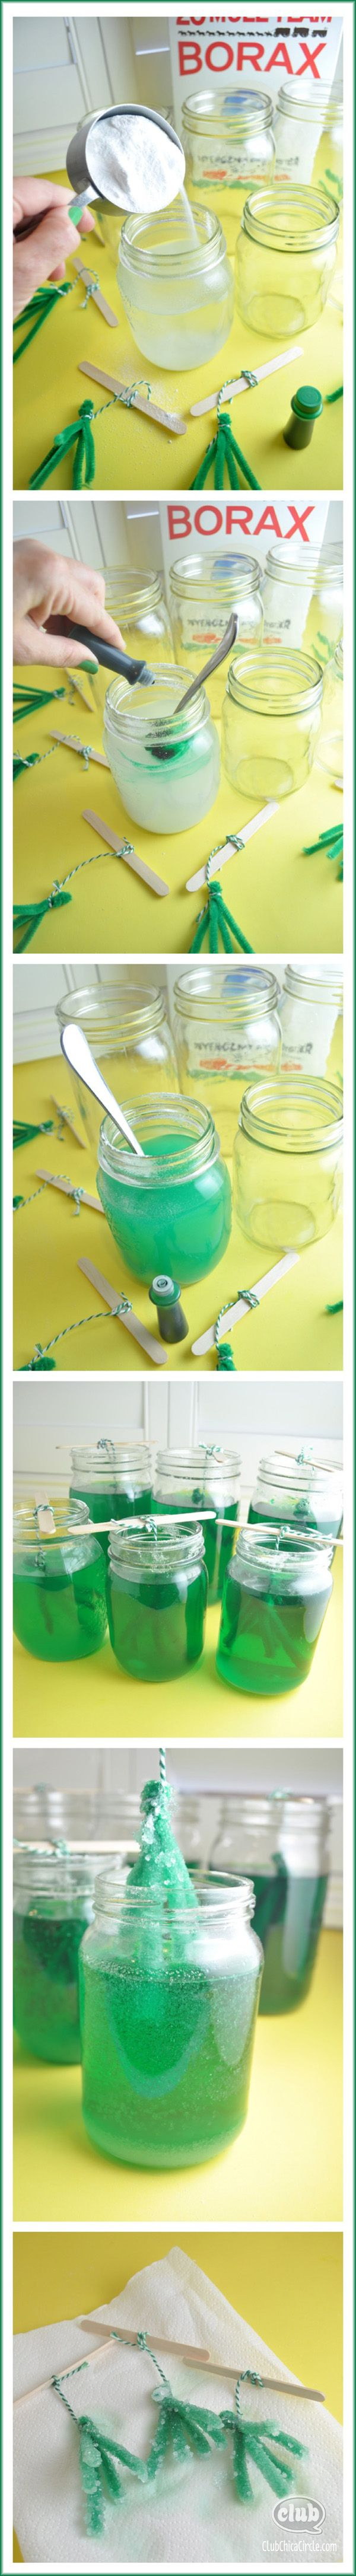 Borax crystals DIY - make your own emerald crystal garden inspired by #DisneyOZMovie #ad. Super fun craft for kids.